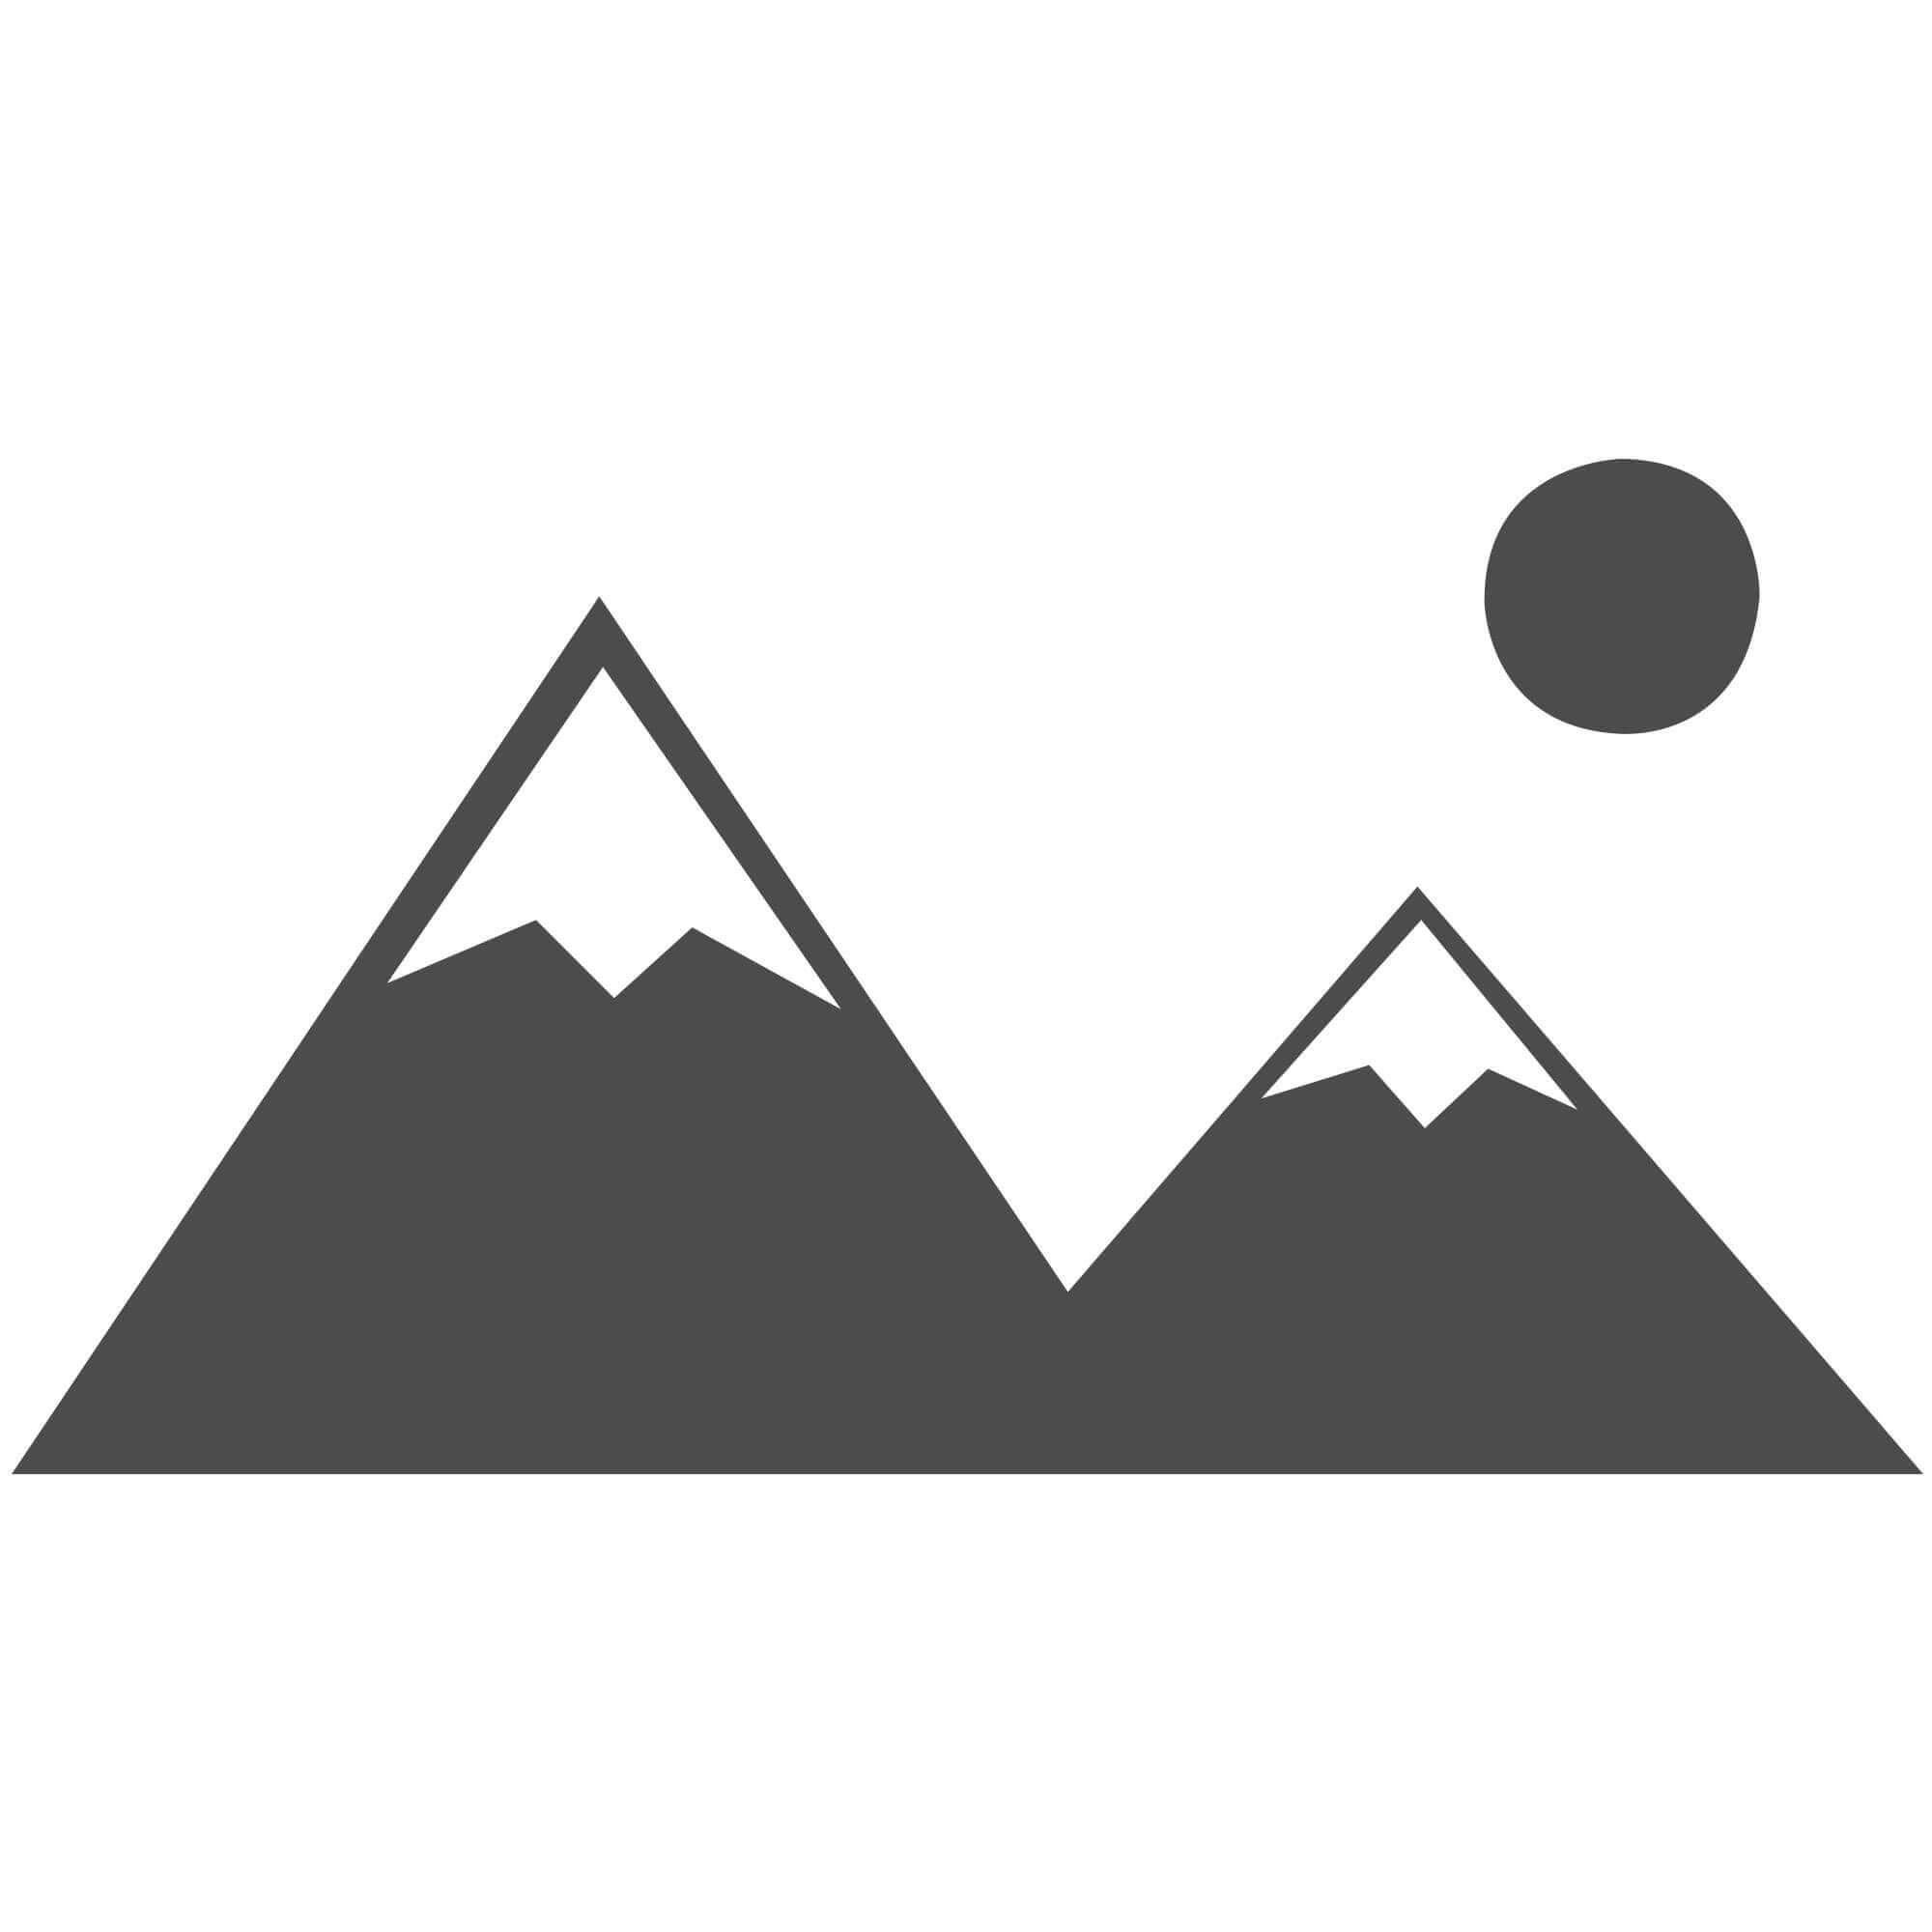 "Verge Hexagon Rug - Grey - Size 120 x 170 cm (4' x 5'7"")"